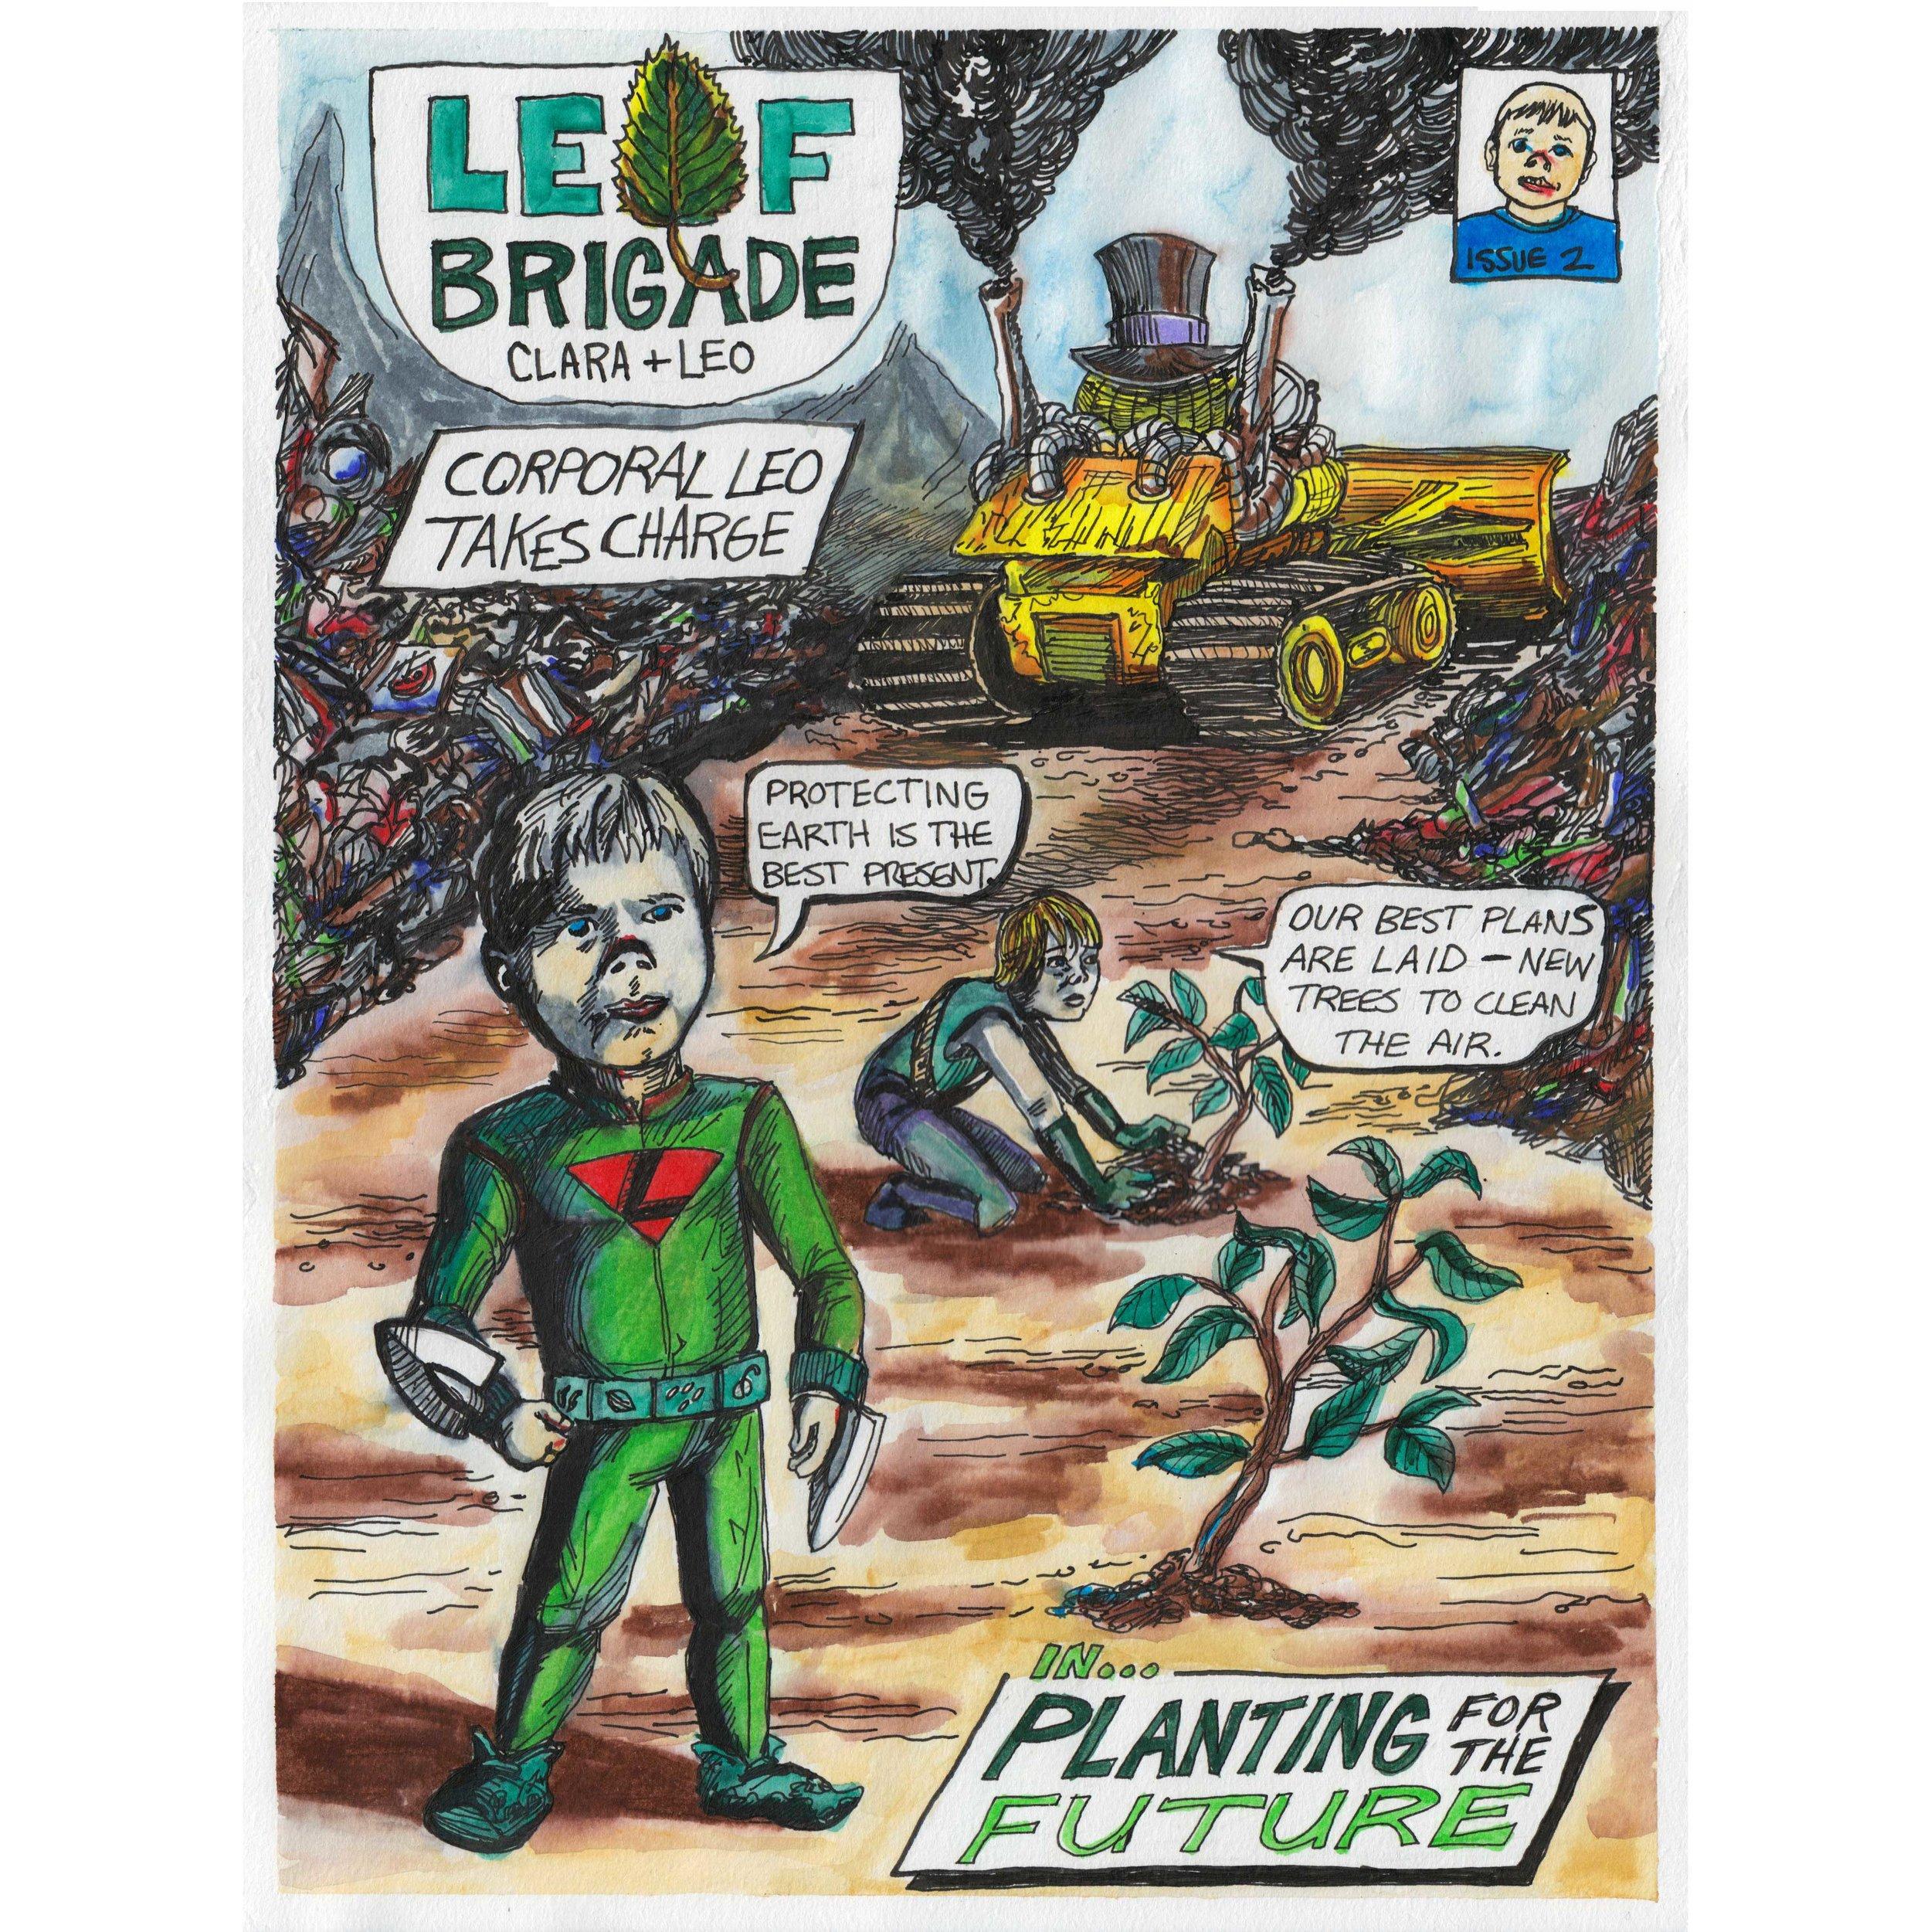 Leaf-Brigade-Leo copy.jpg